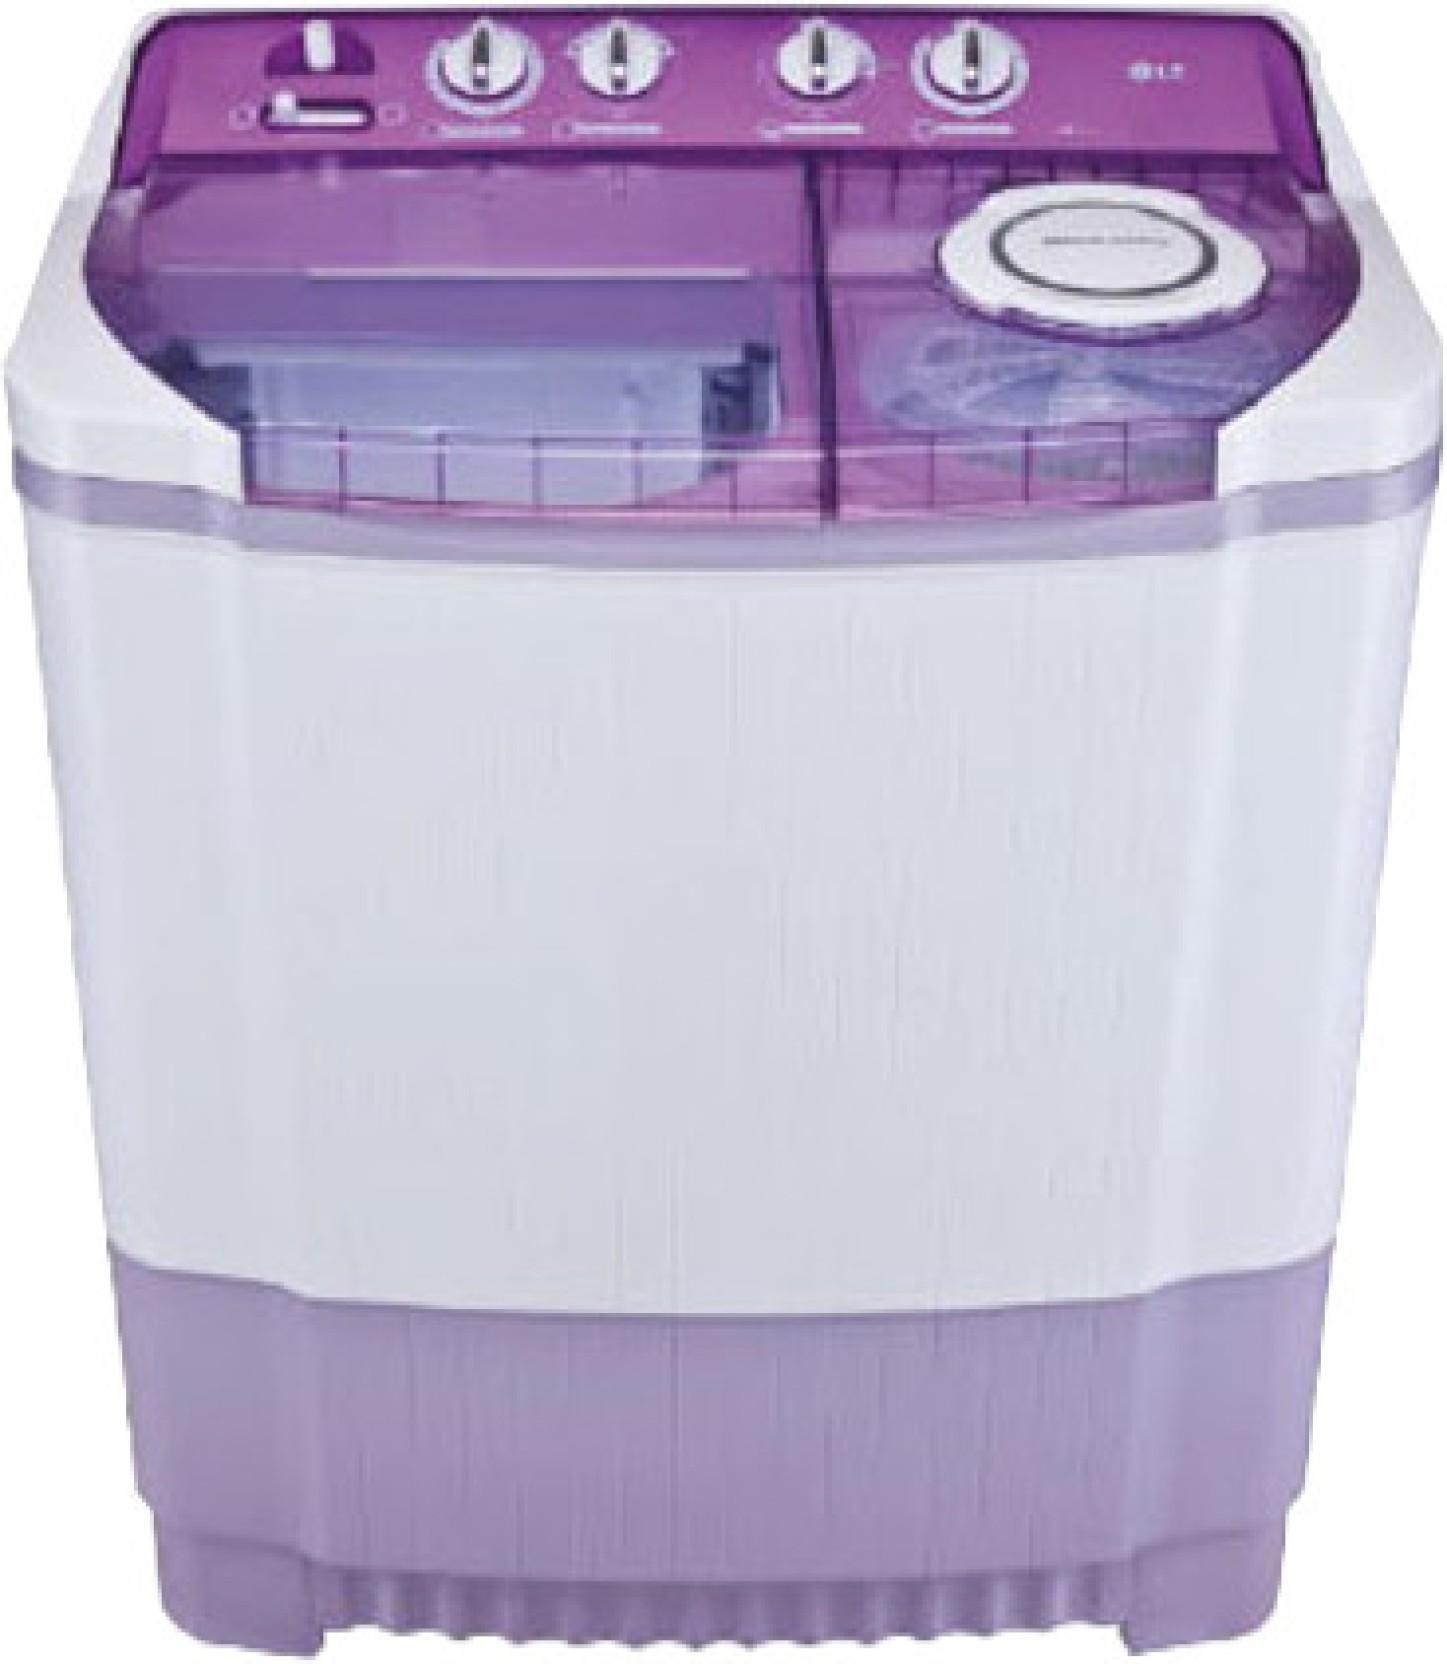 LG 7.2 kg Semi Automatic Top Load Washing Machine Price in ...